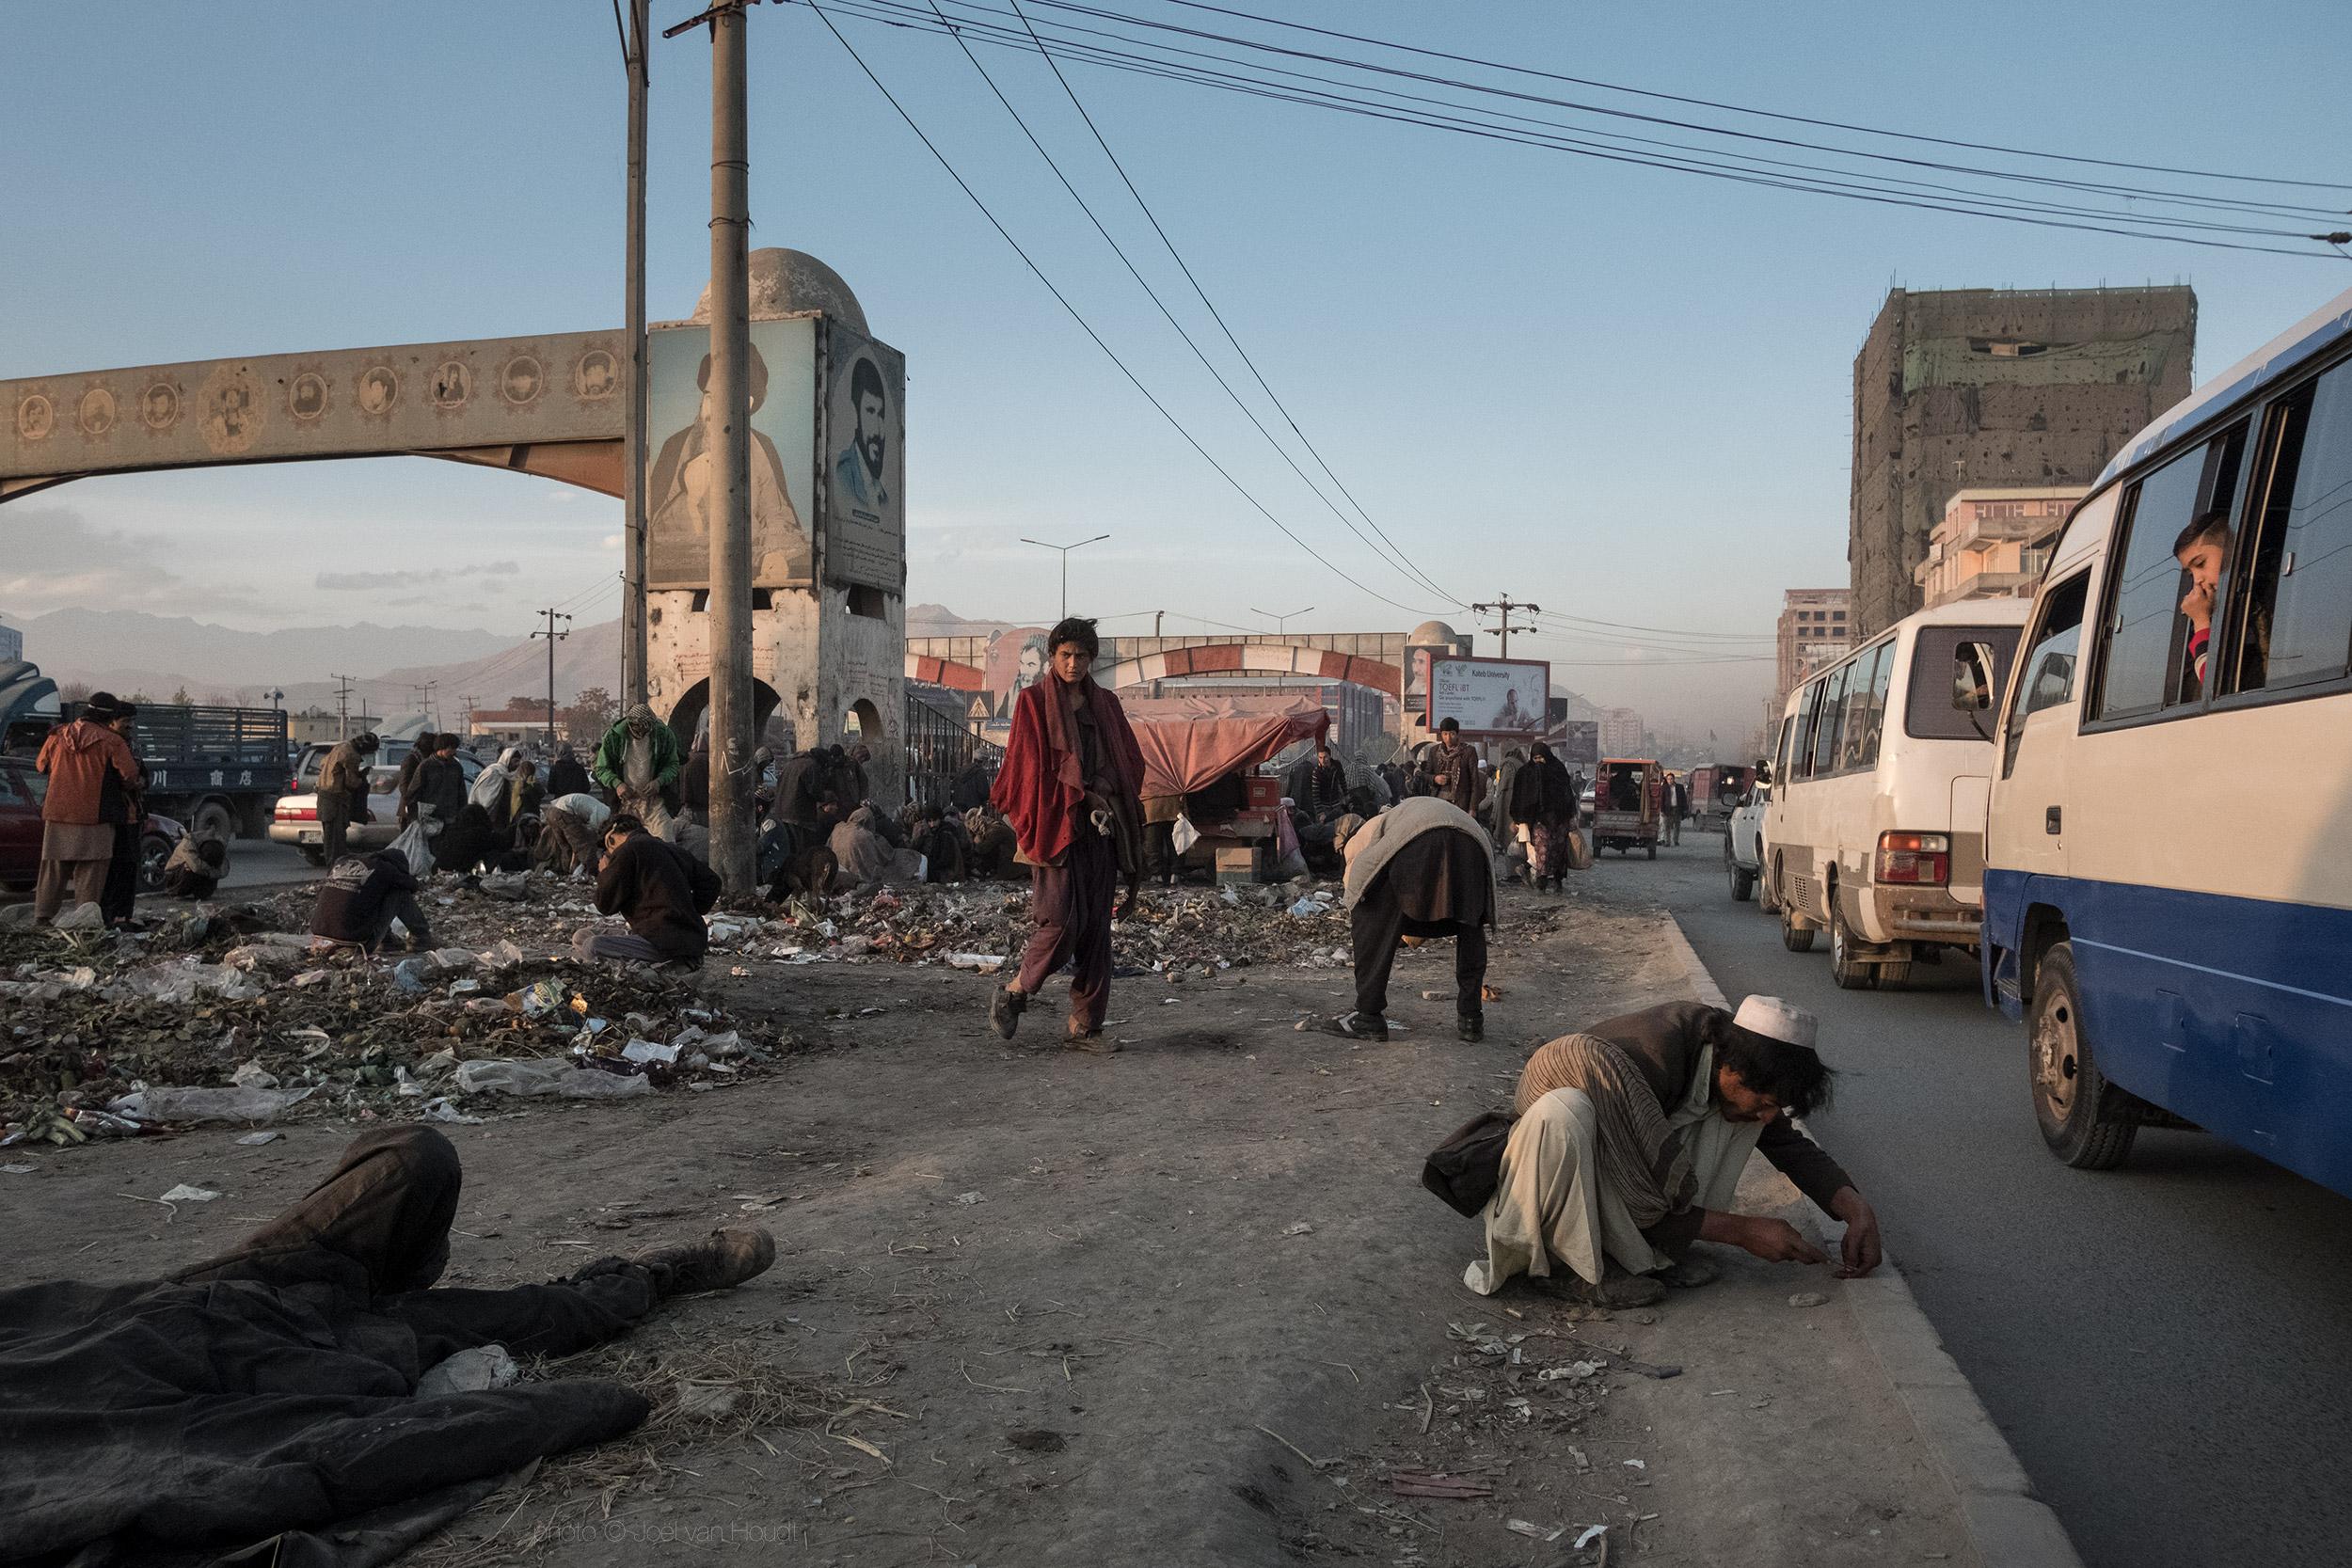 Afghanistan, December 4, 2016